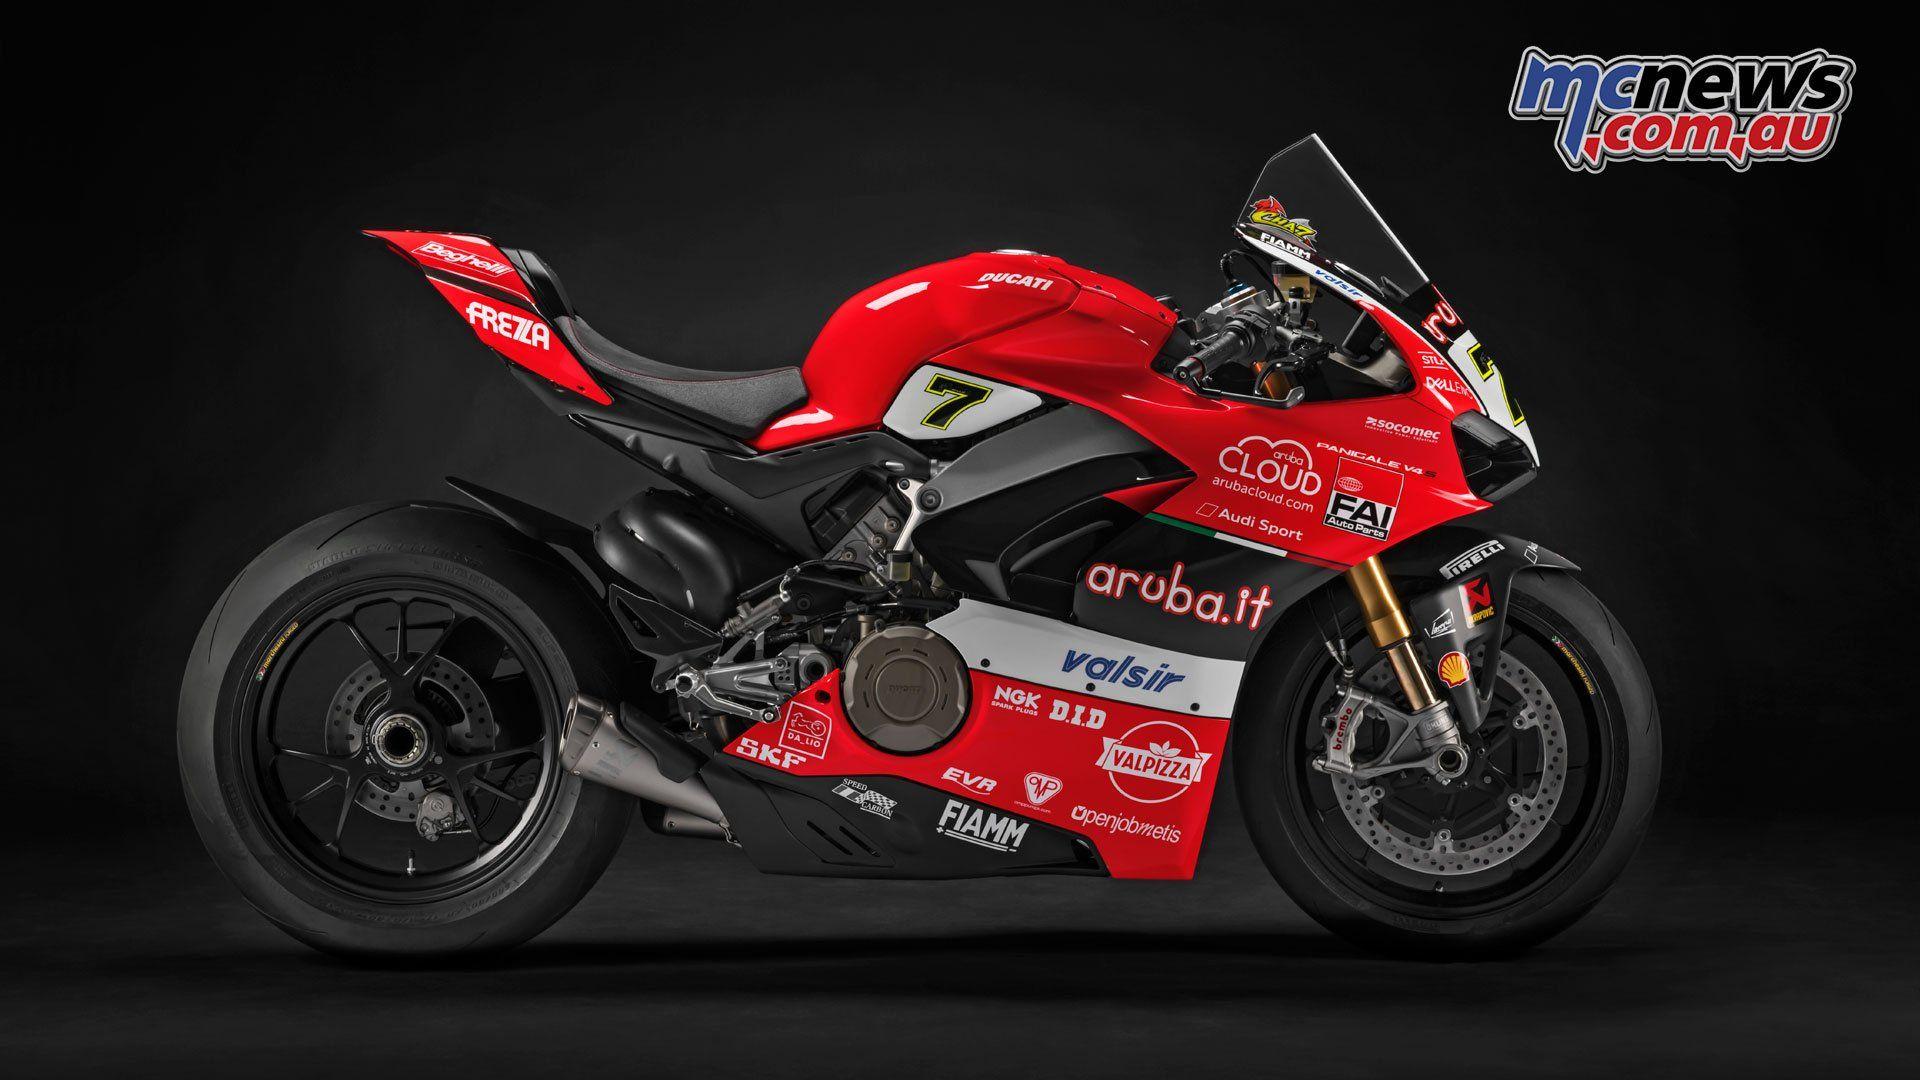 Ducati V4 Wsbk 2019 Price From Alvaro Bautista On Aruba Ducati Panigale V4 For Wsbk 2019 Mcnews Pertaining To Ducati V4 Wsbk Ducati Panigale Panigale Ducati